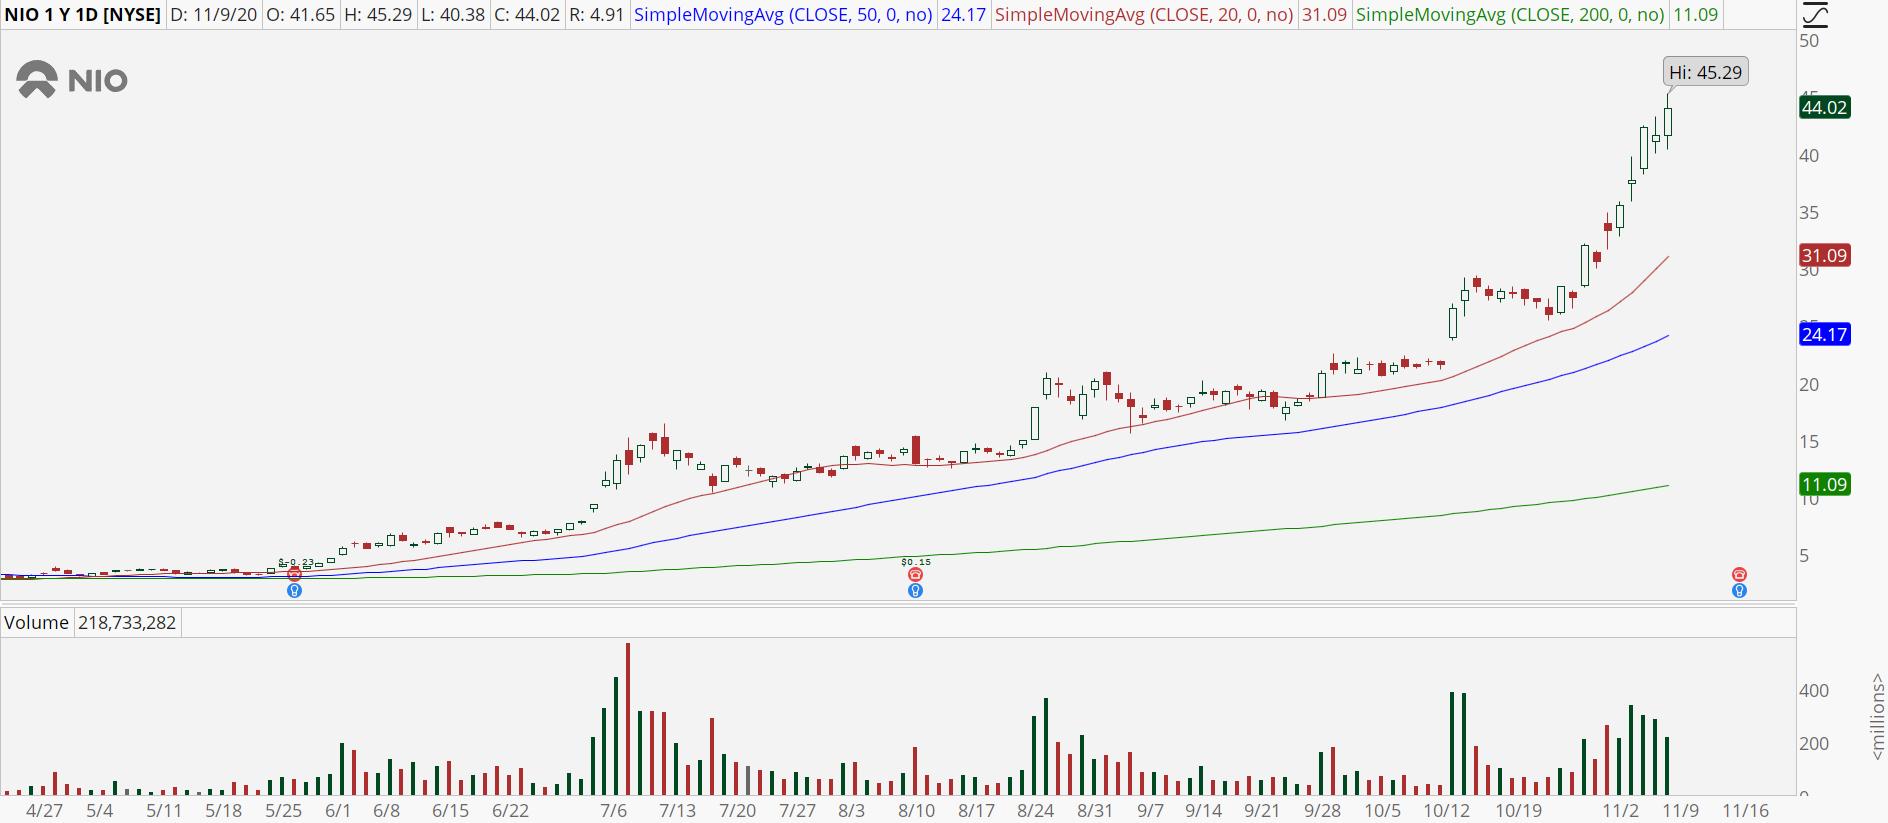 Nio (NIO) stock chart showing extreme momentum